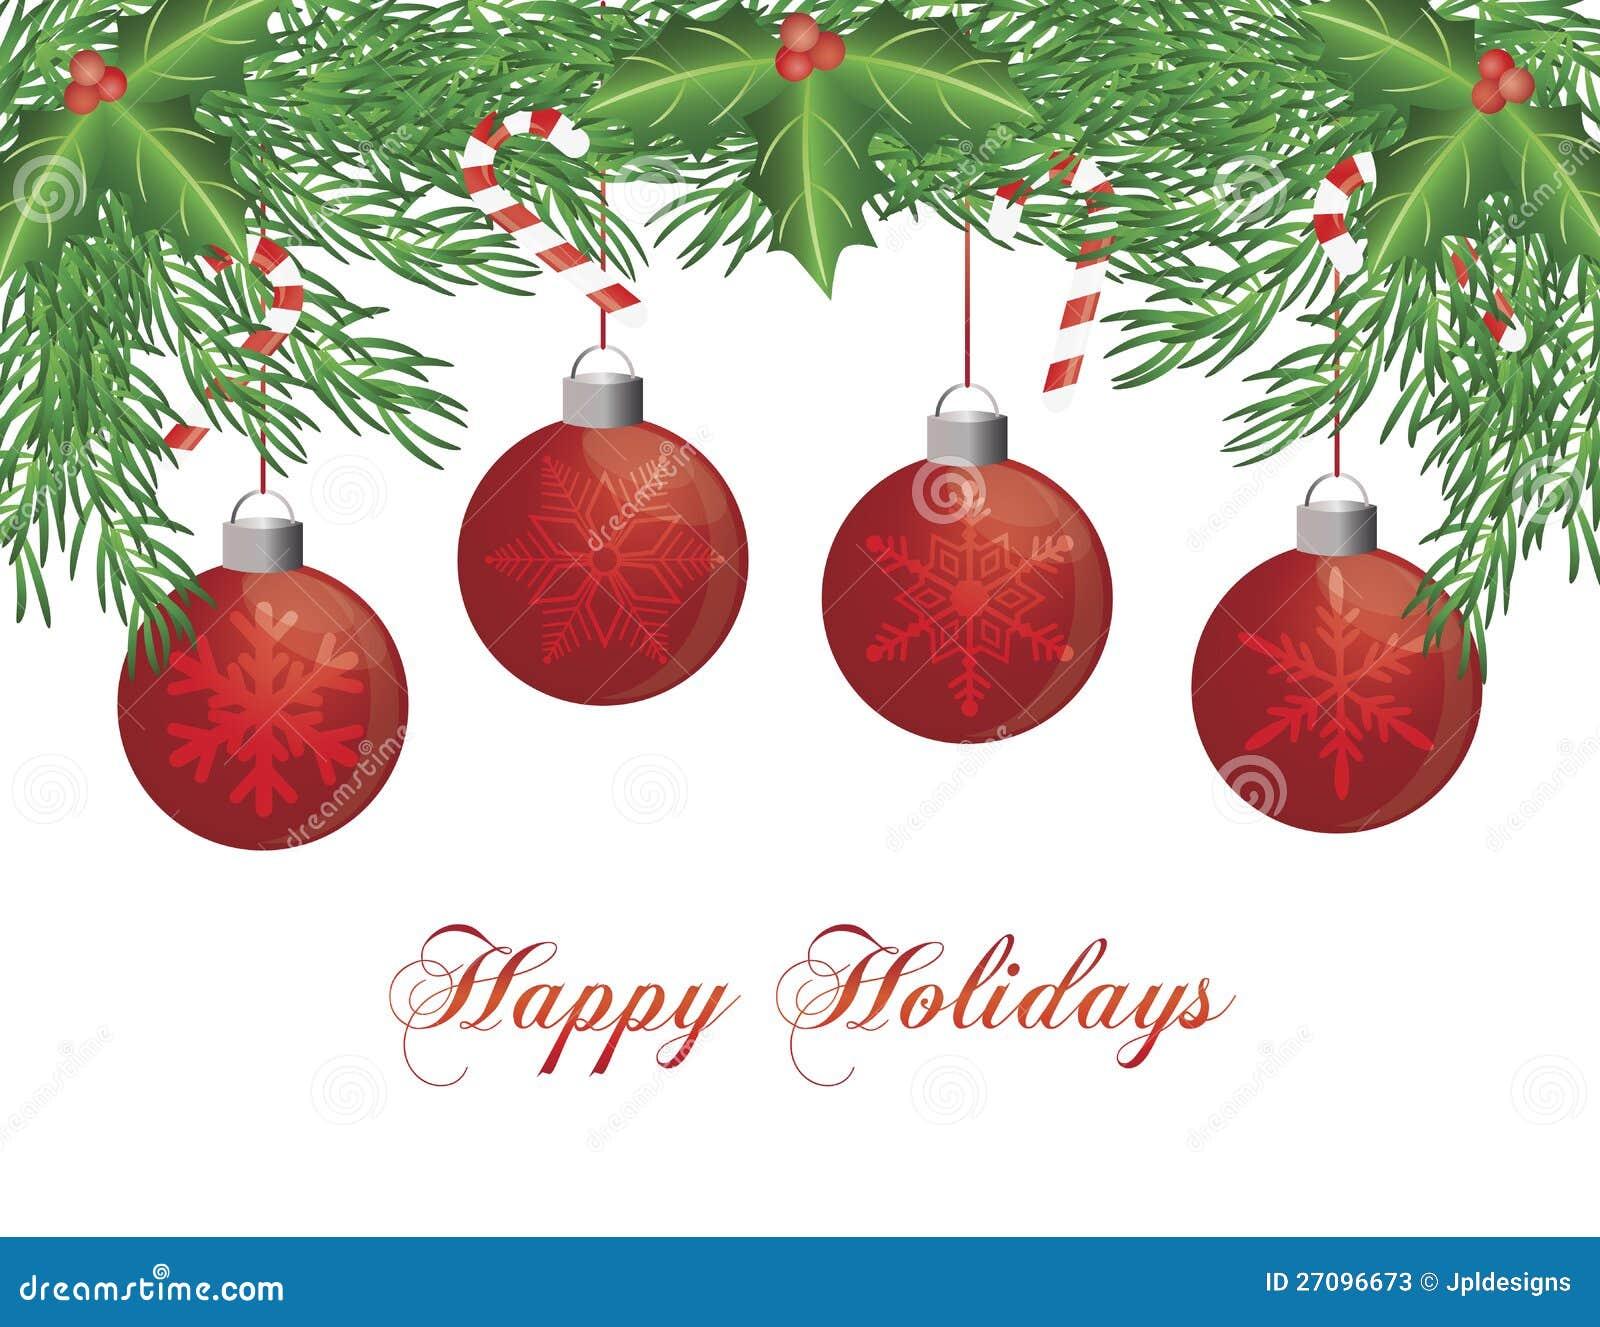 Weihnachtsbaum Girlande.Weihnachtsbaum Girlande Mit Verzierung Abbildung Stock Abbildung